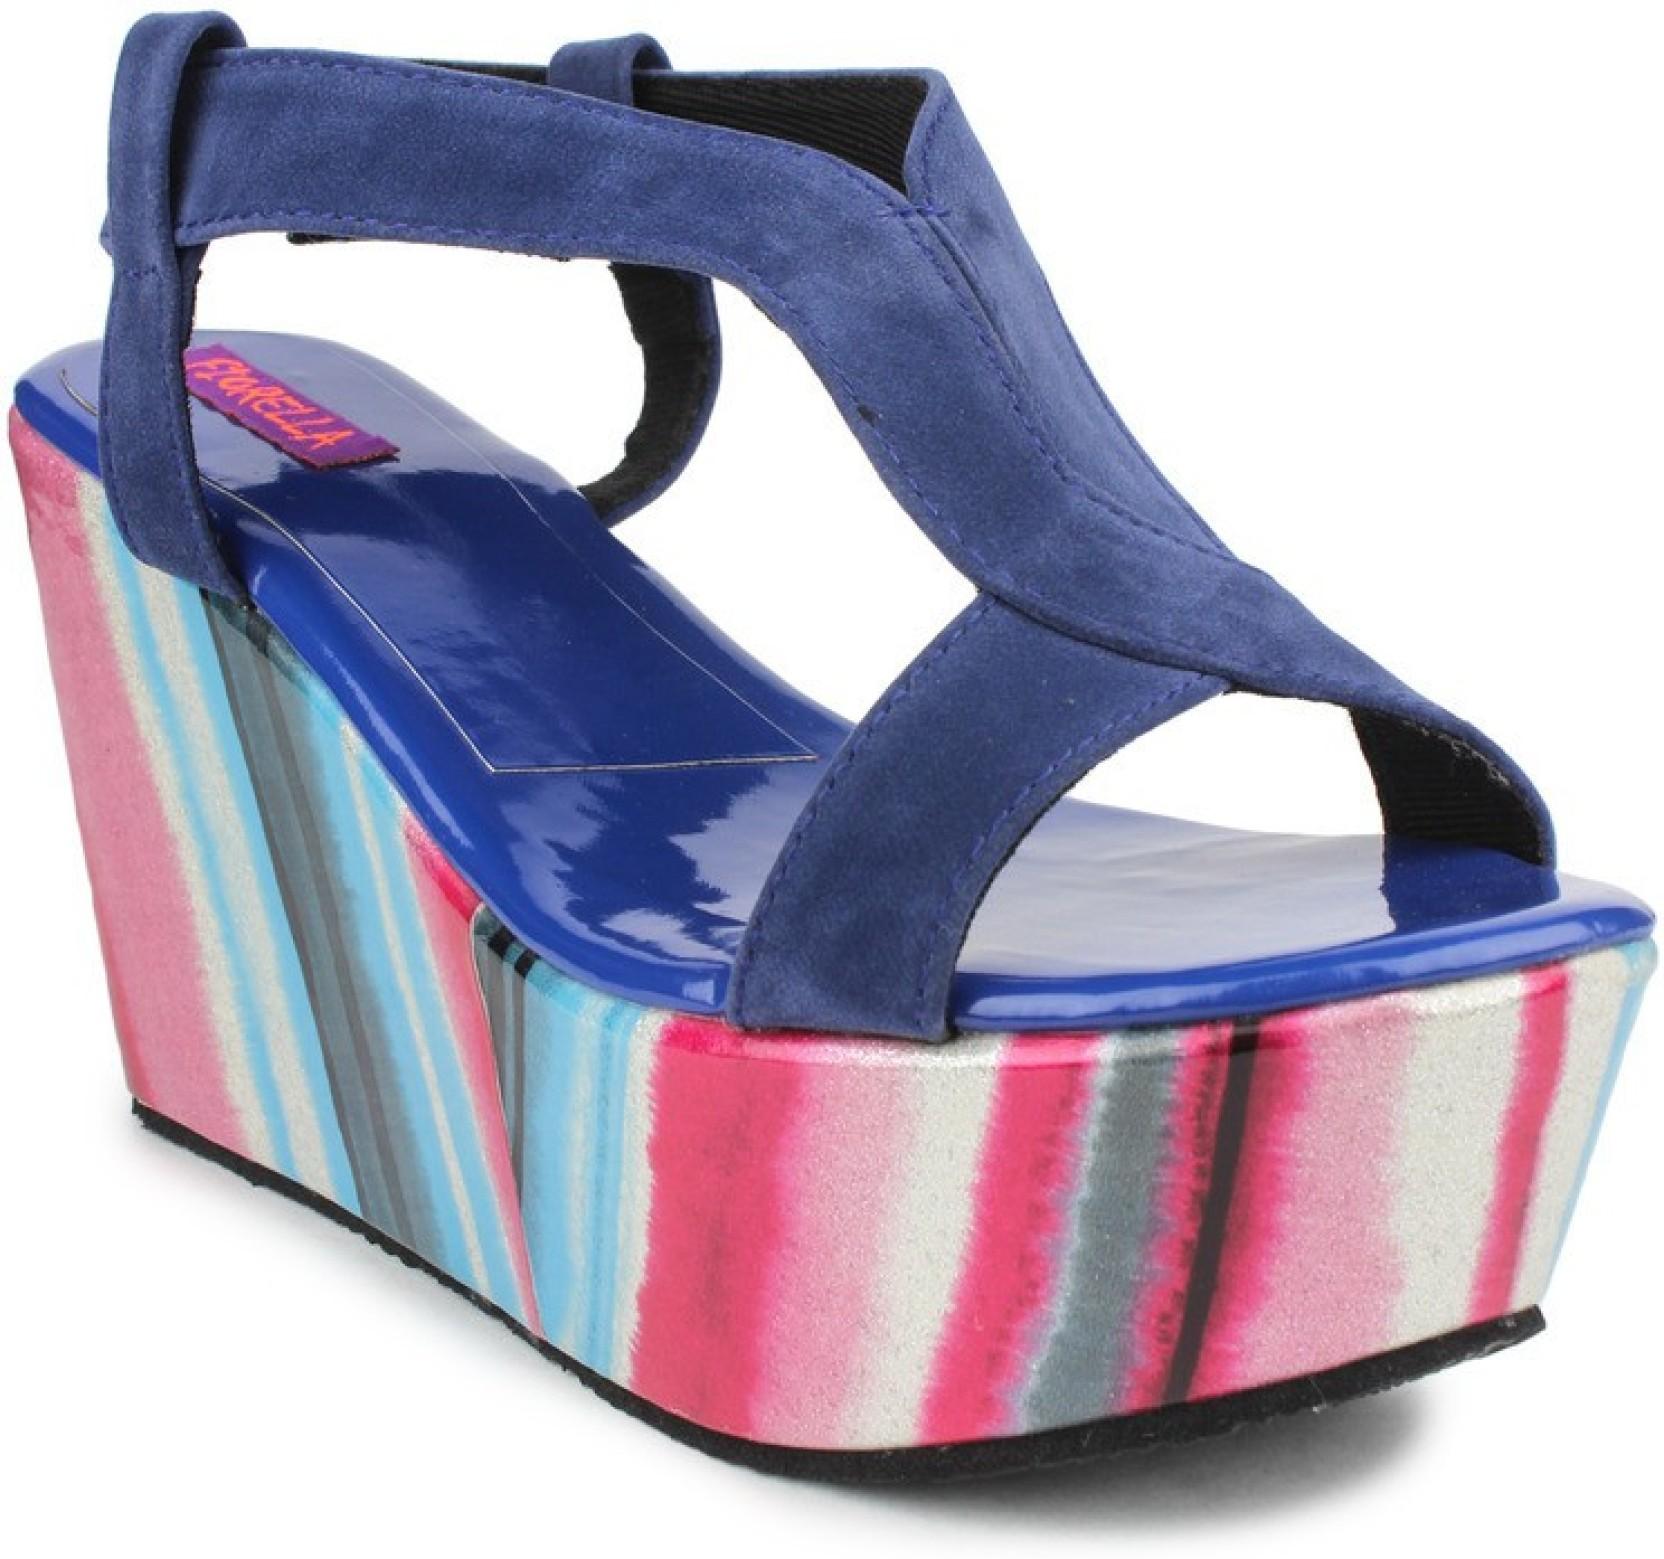 480764a00e1 Fiorella Women Blue Heels - Buy Blue Color Fiorella Women Blue Heels ...